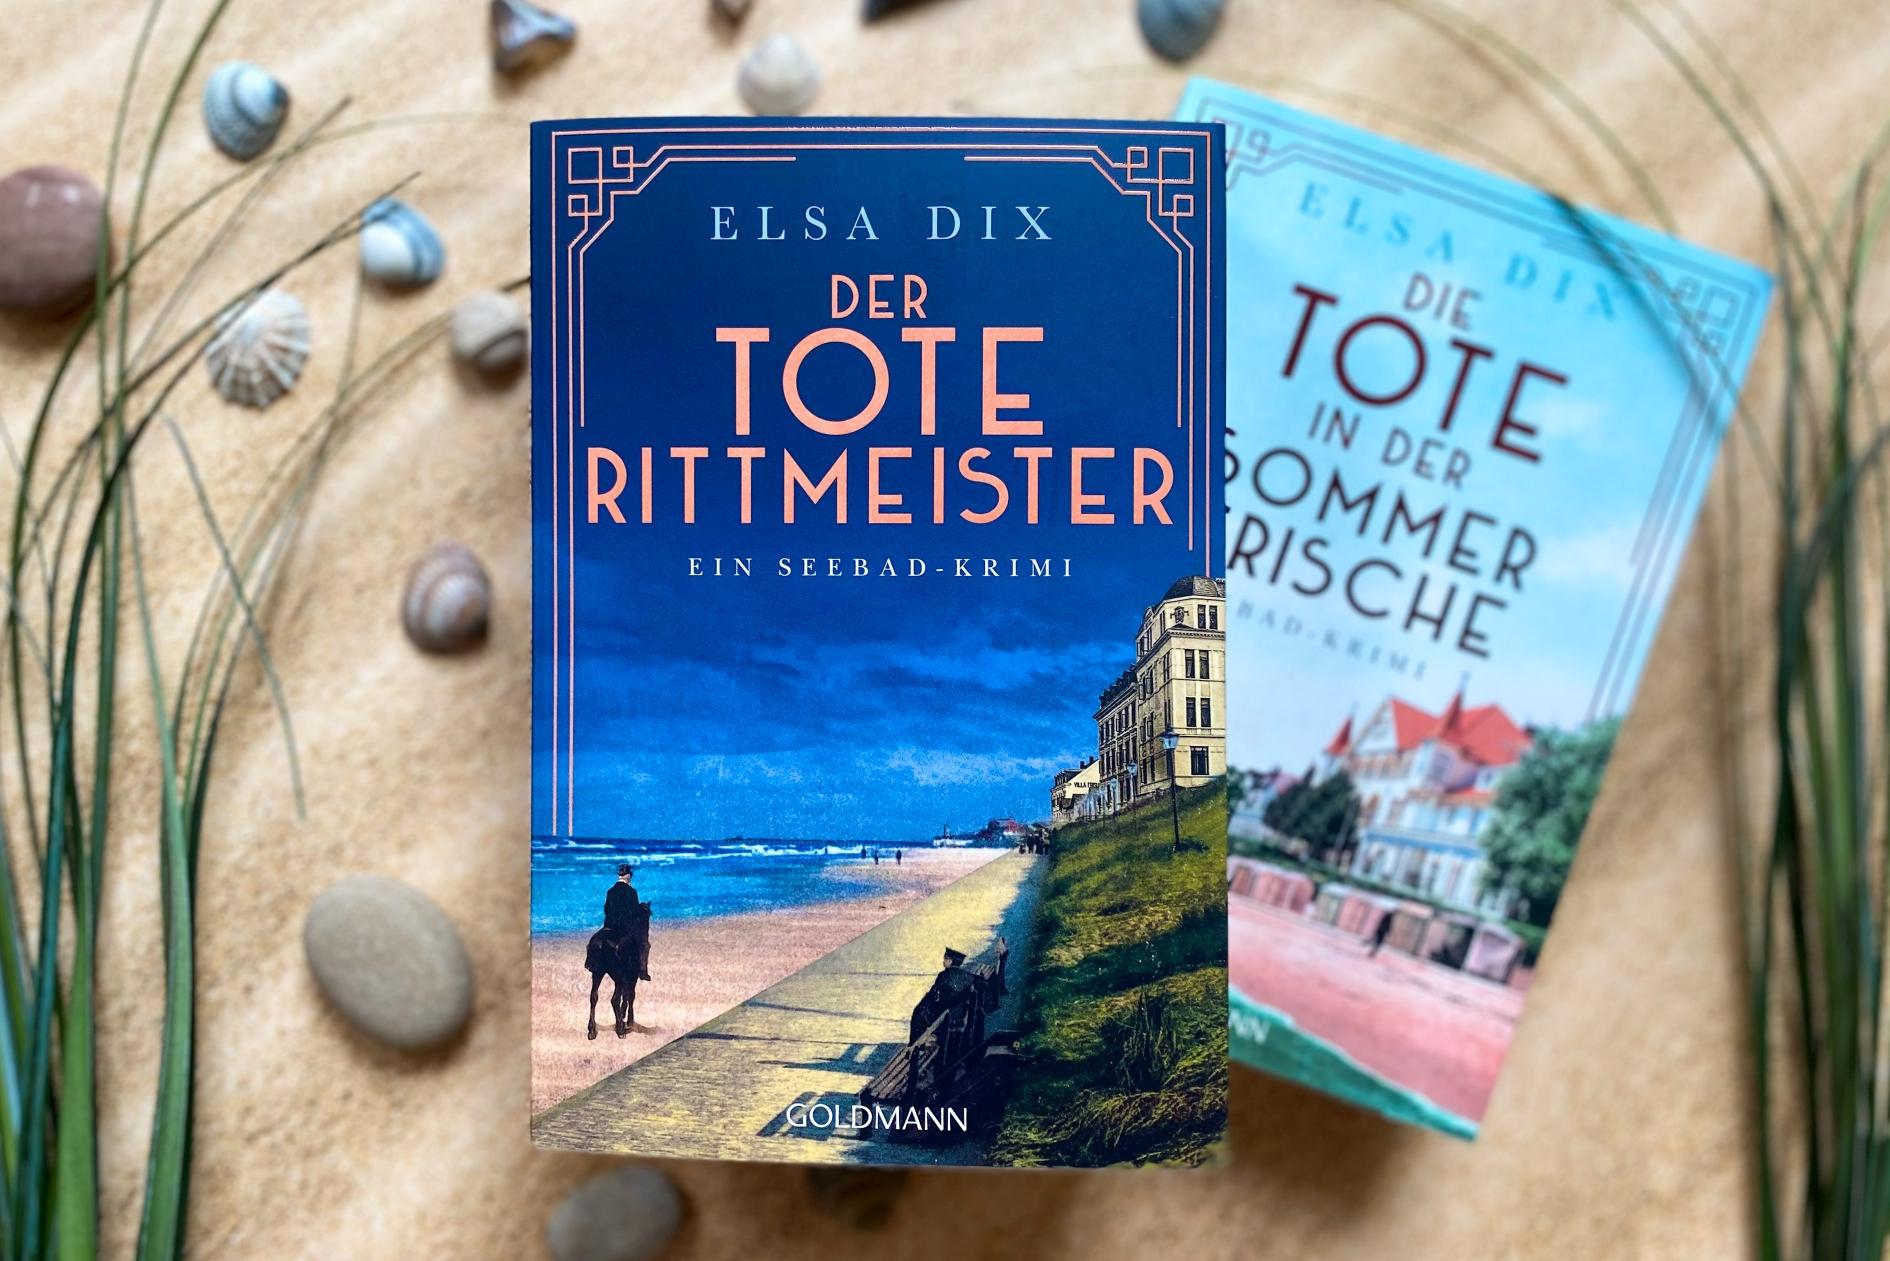 Elsa Dix Der tote Rittmeister Norderney Seebad Krimi Kaiserzeit